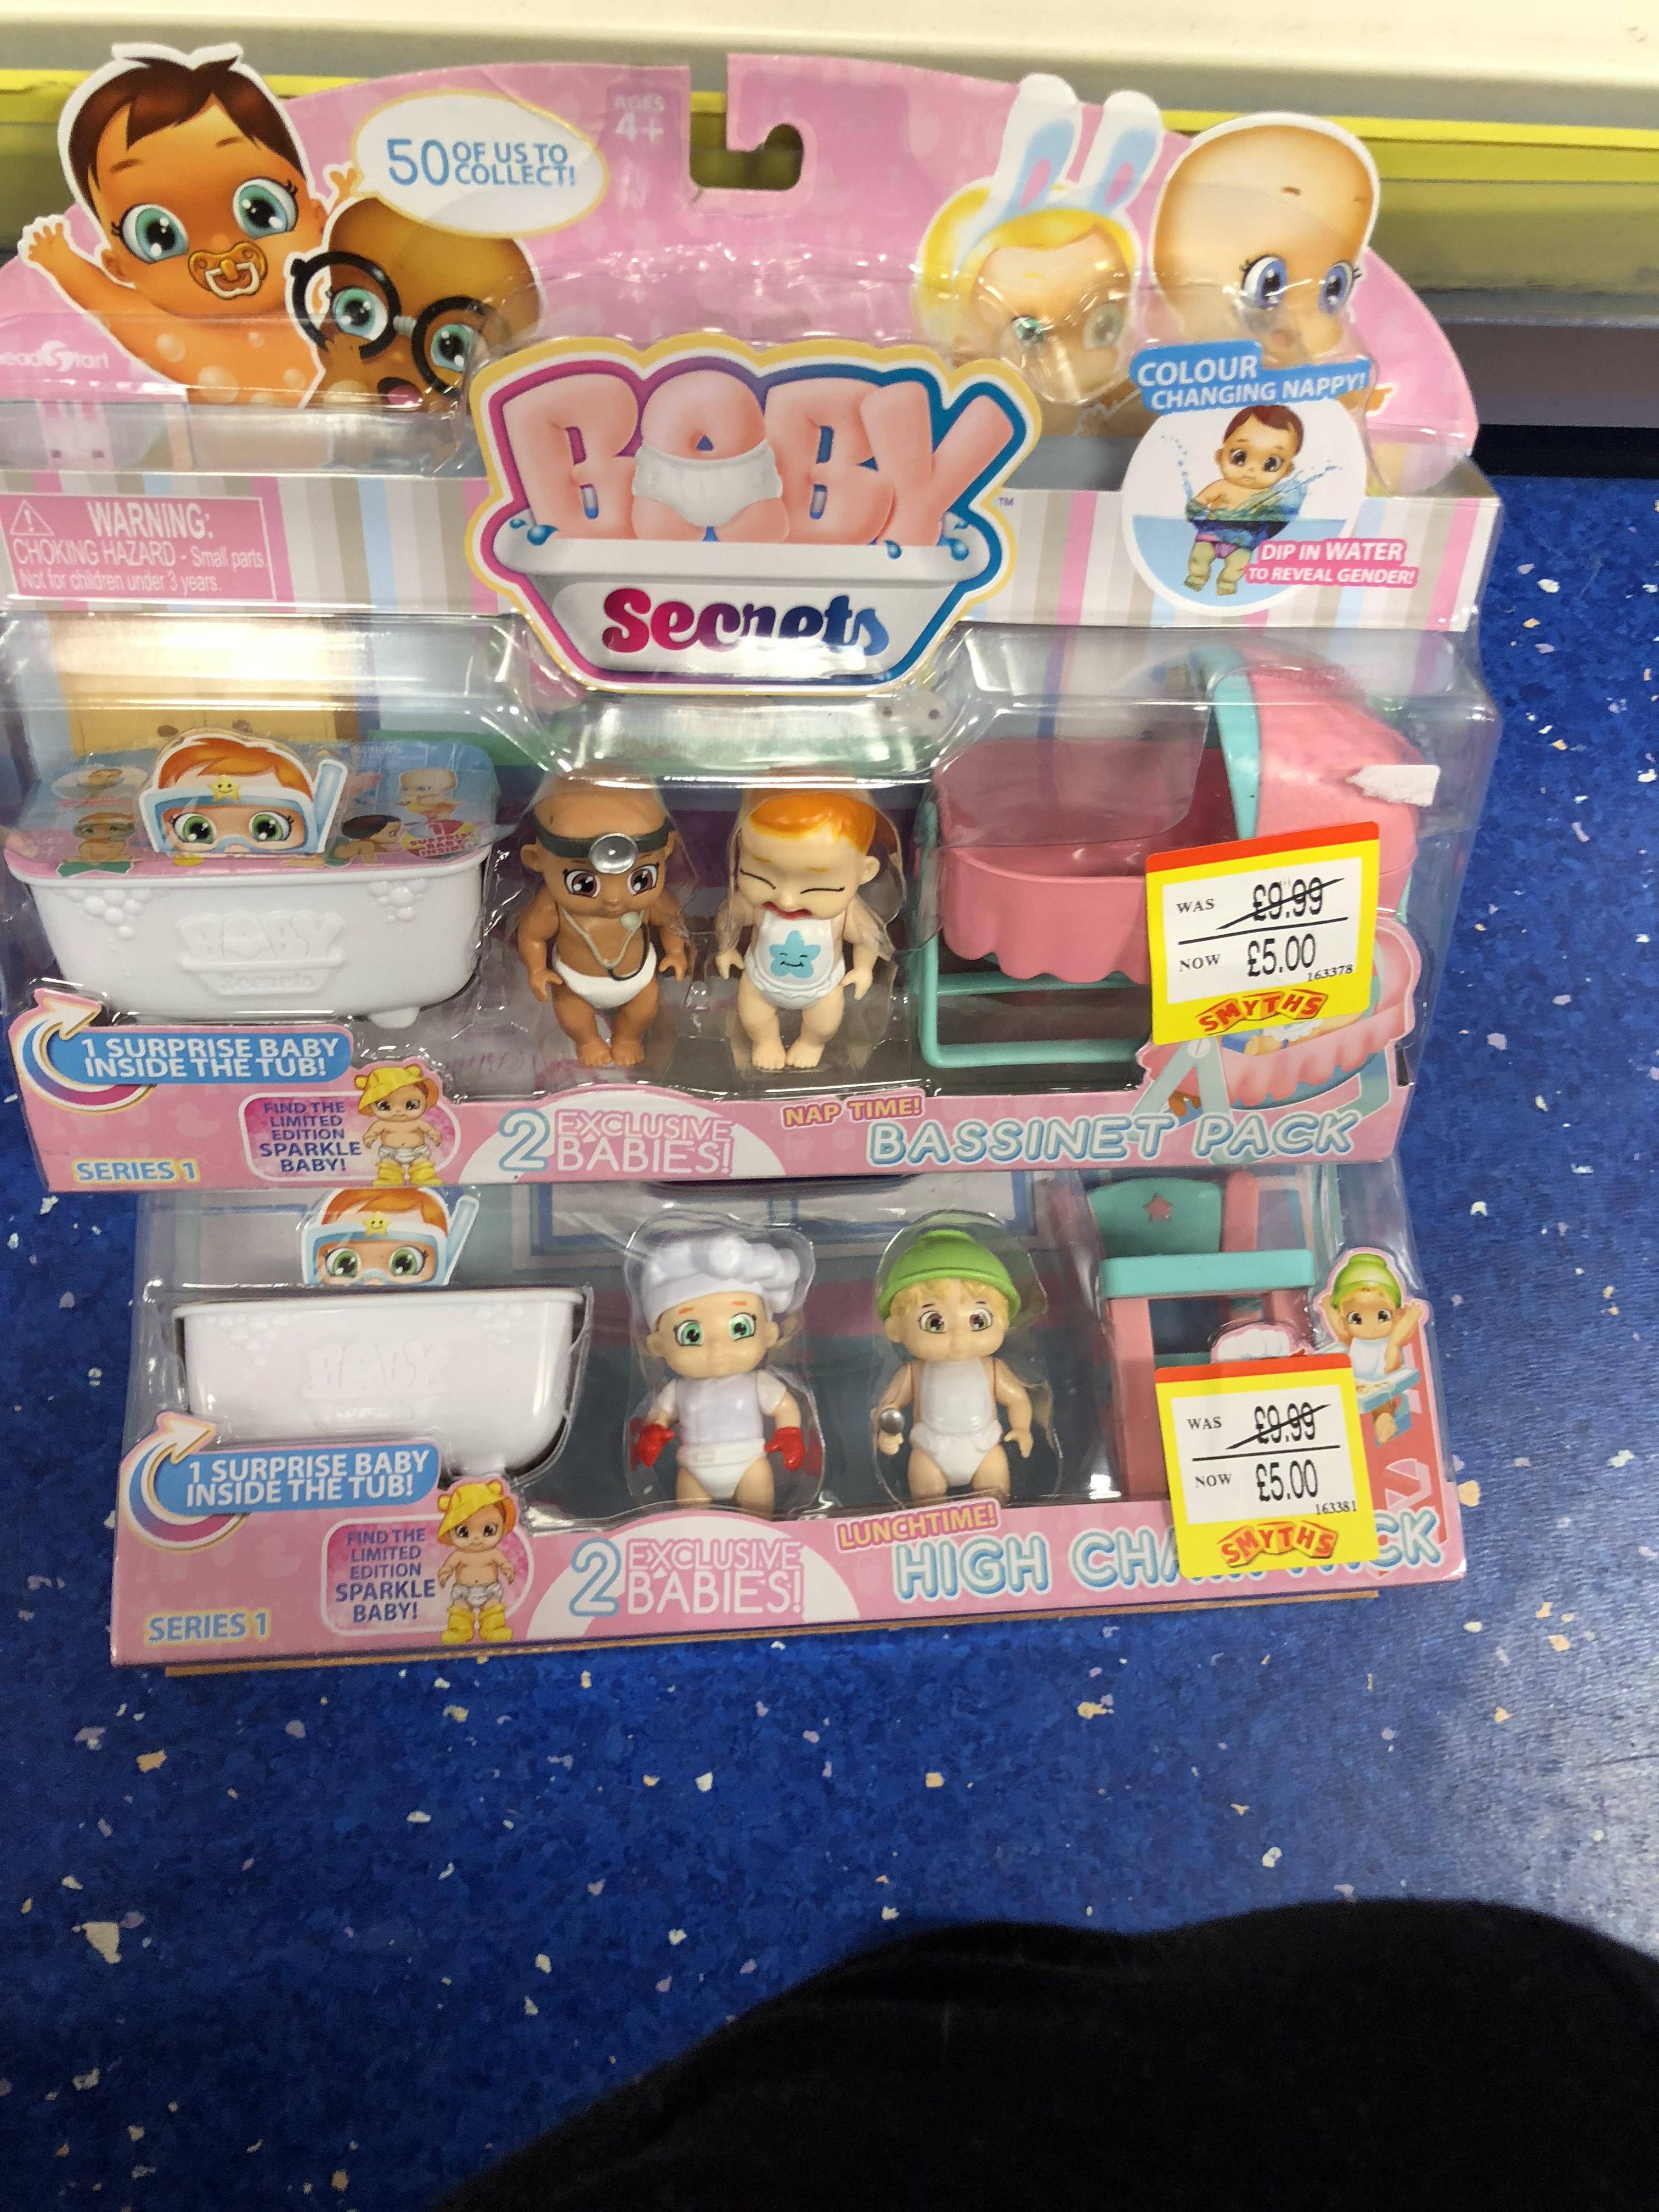 Baby secrets £5 smyths crayford